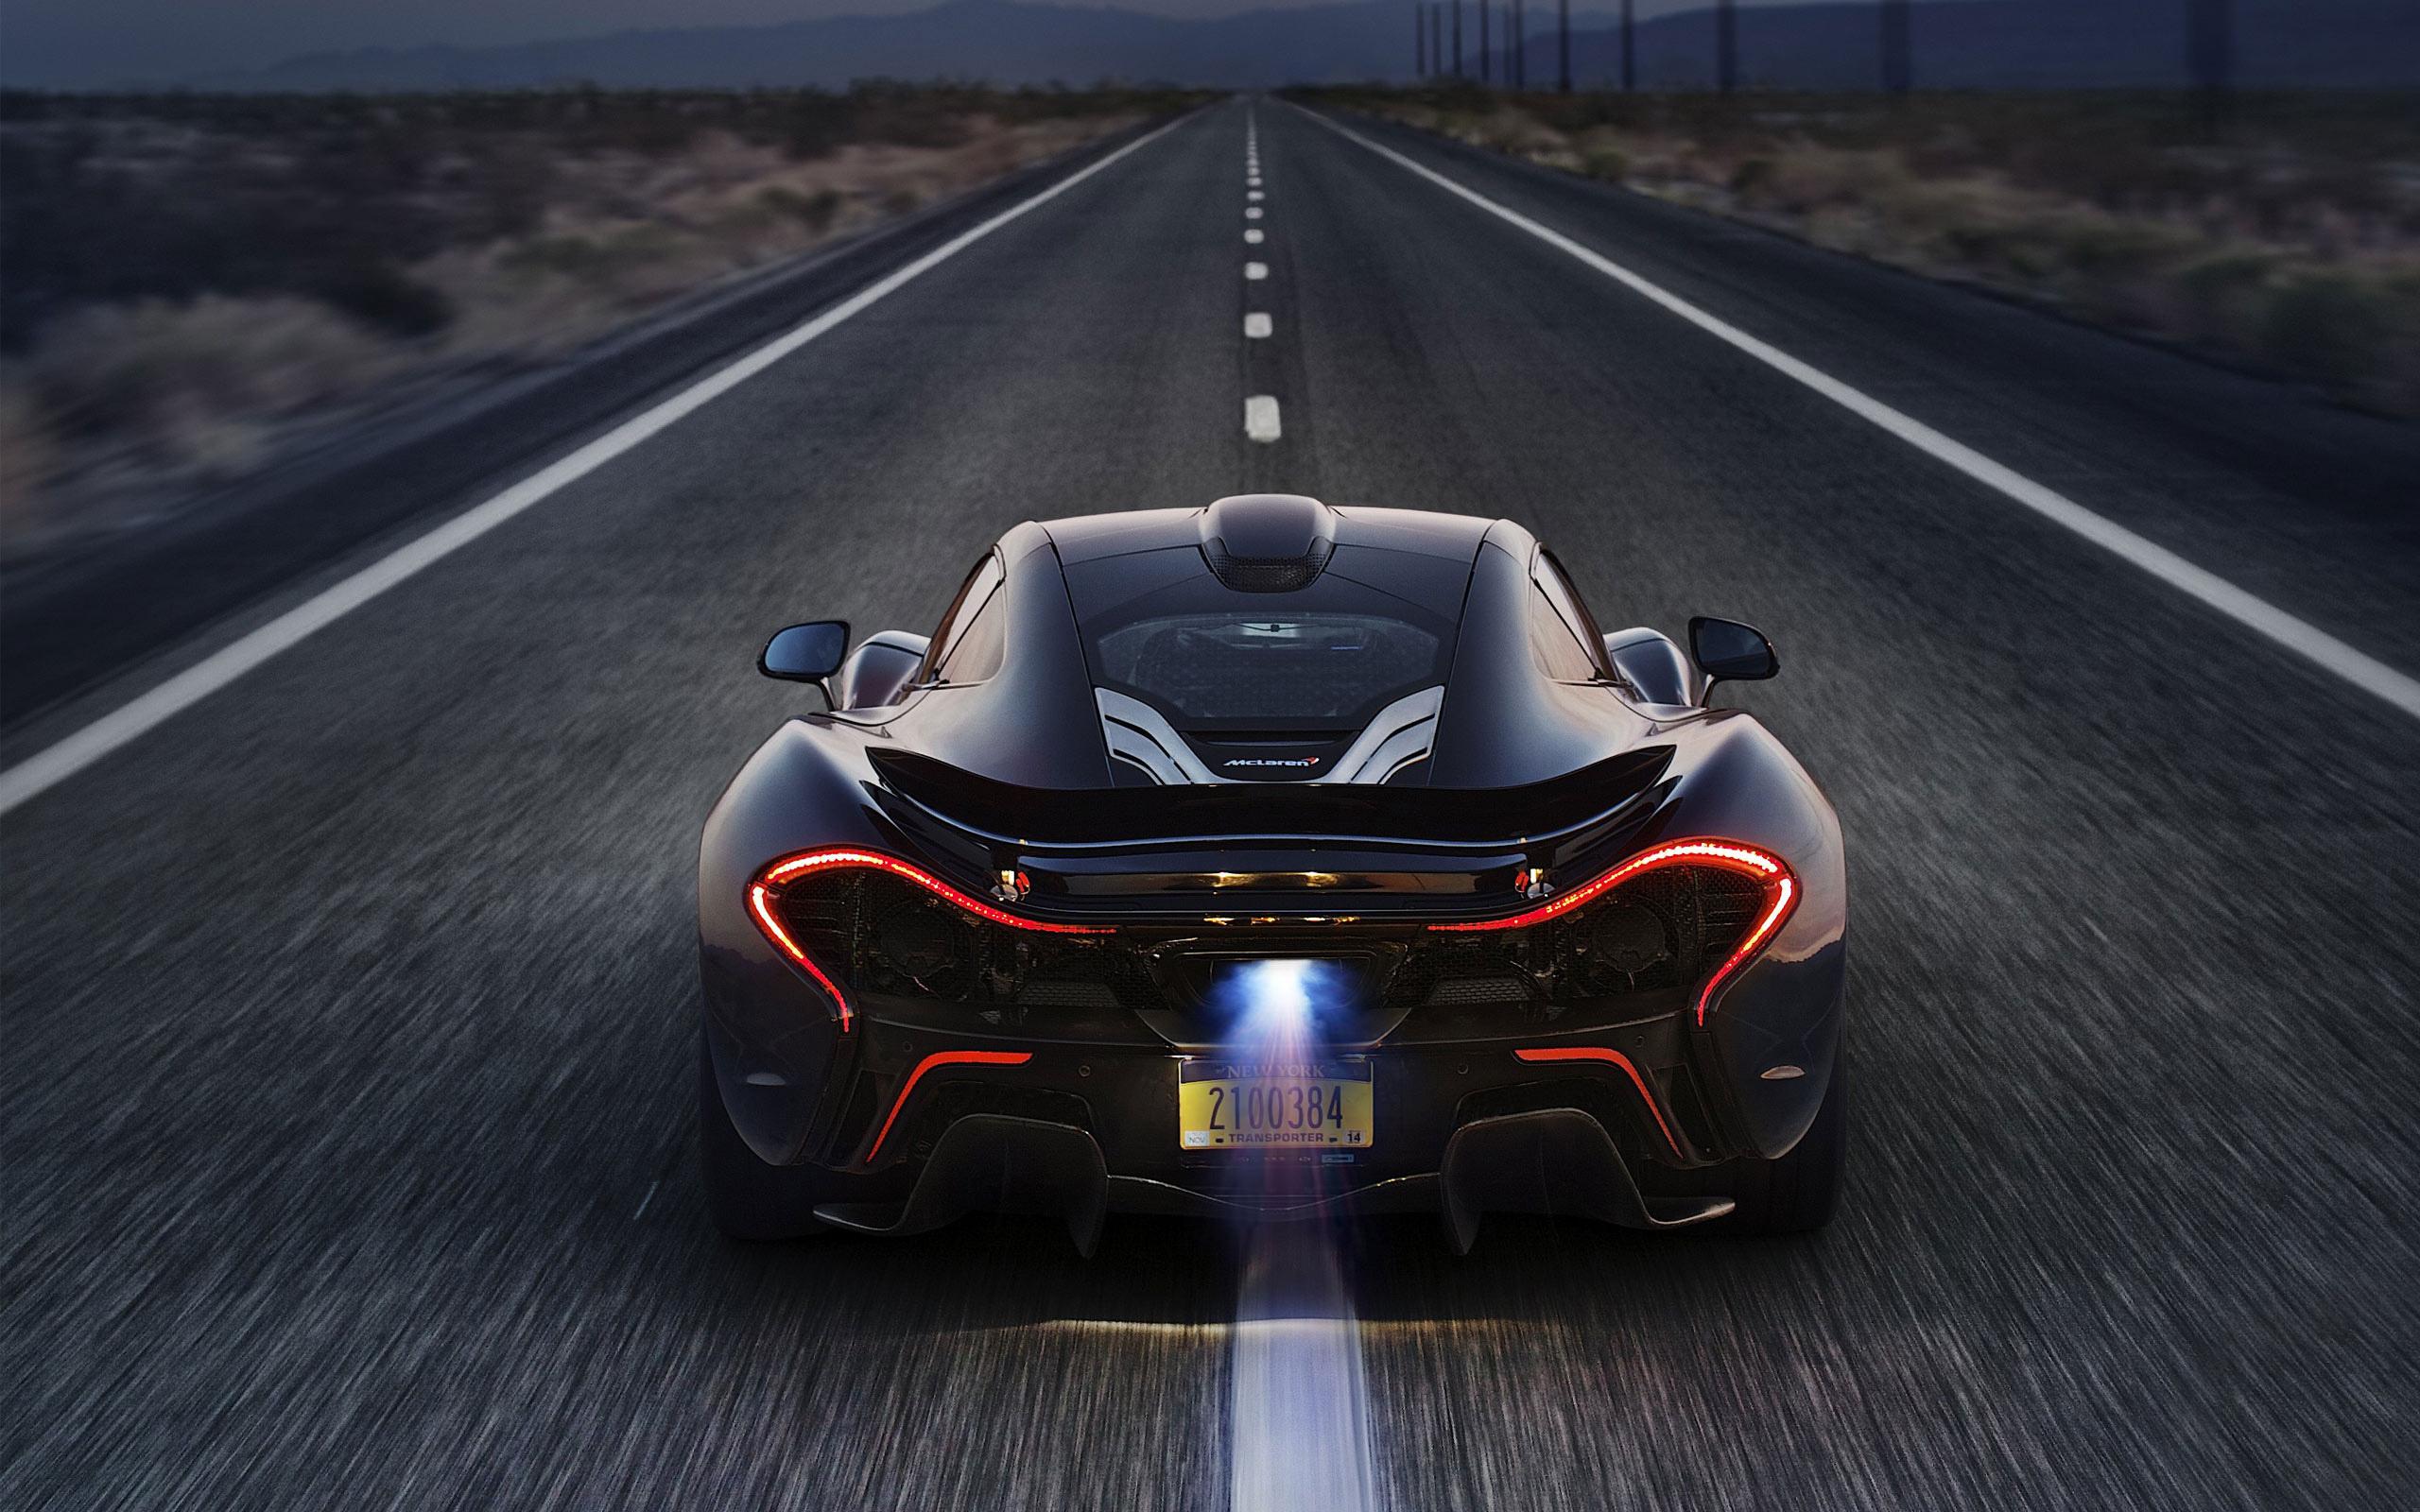 List Of Car Brands >> McLaren P1 flame on exhaust HD